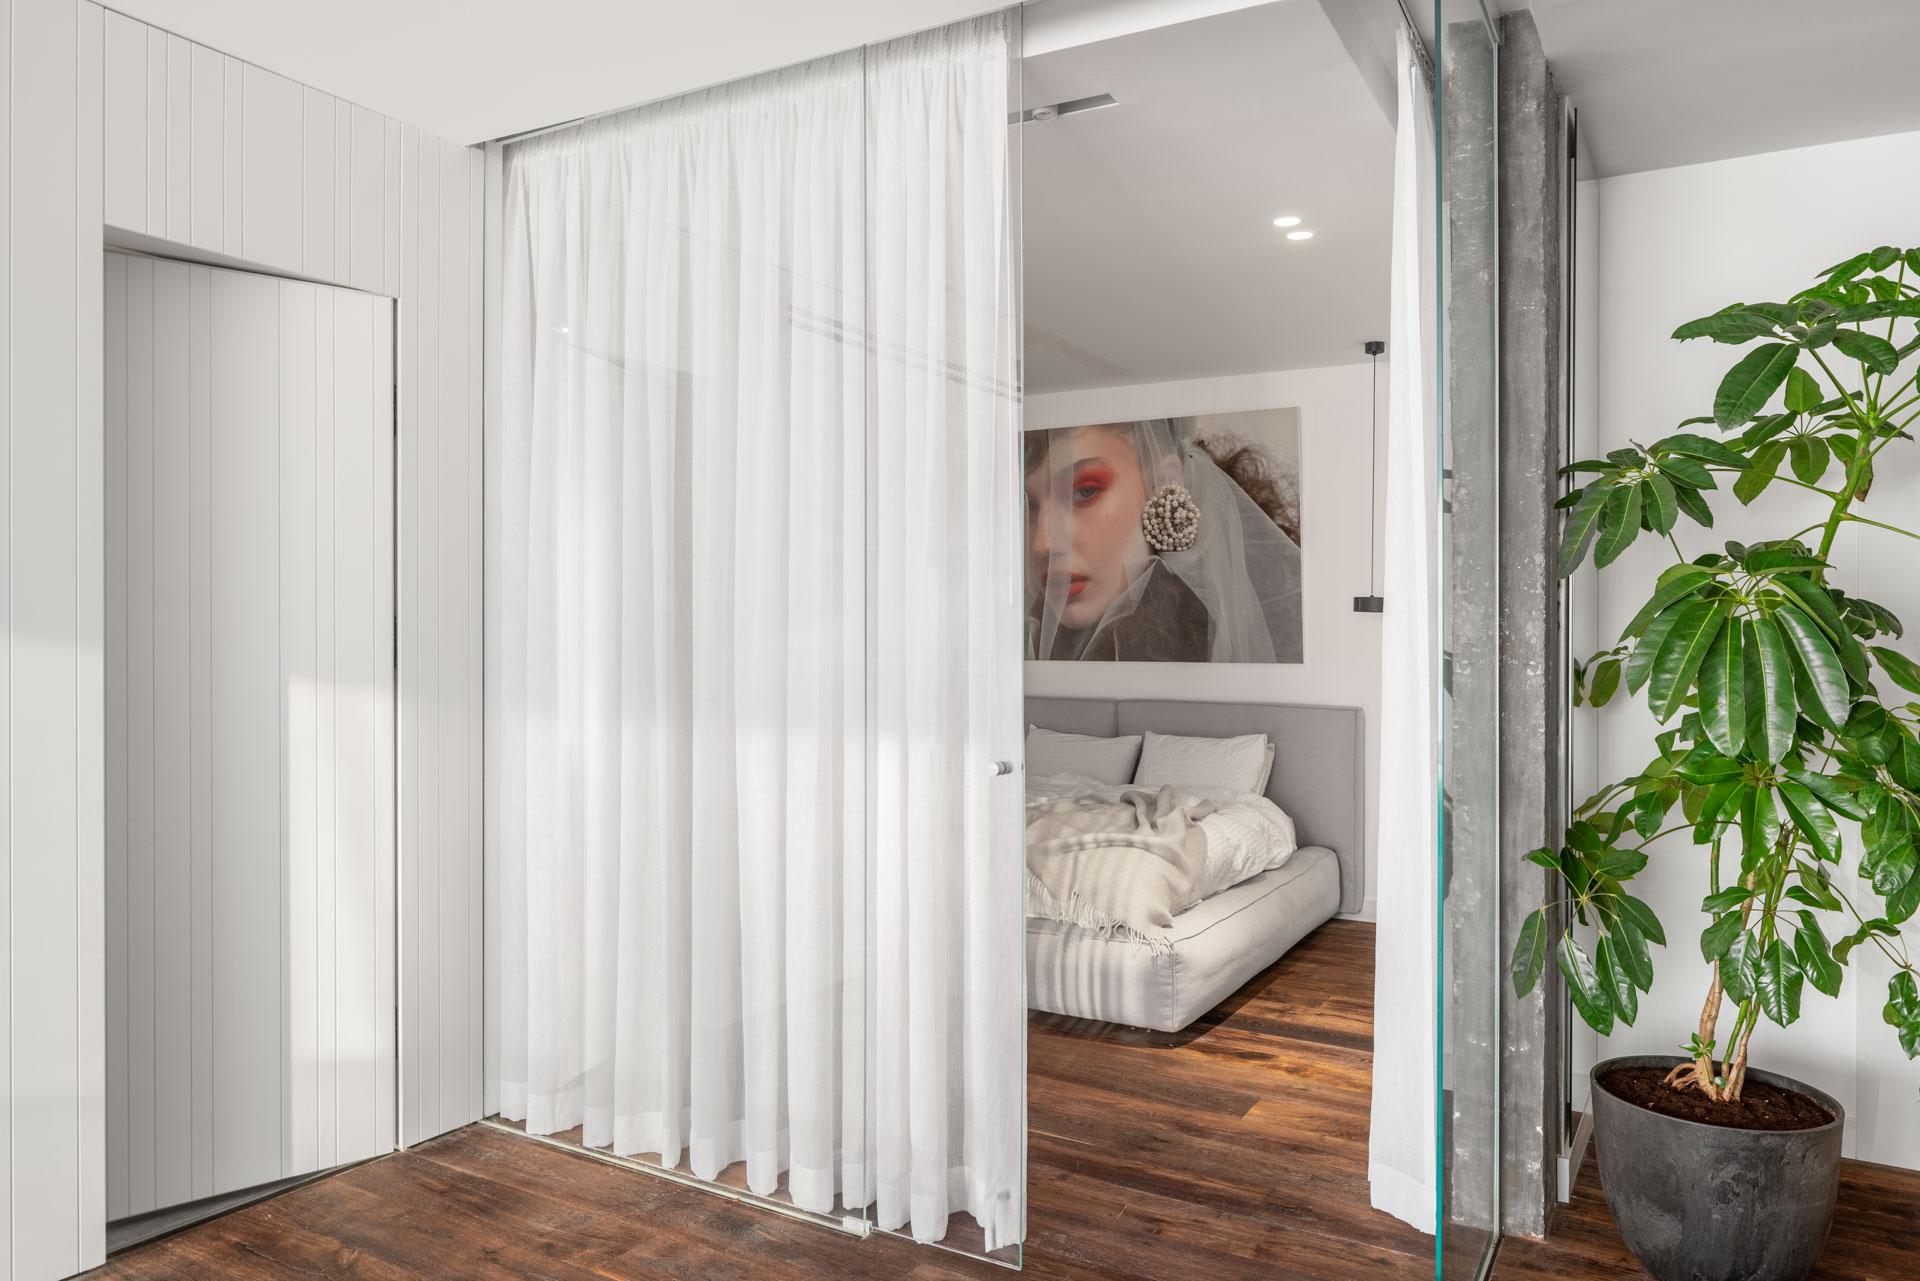 Peled-Studios-Two-Apartments_-572-HDR-copy-1